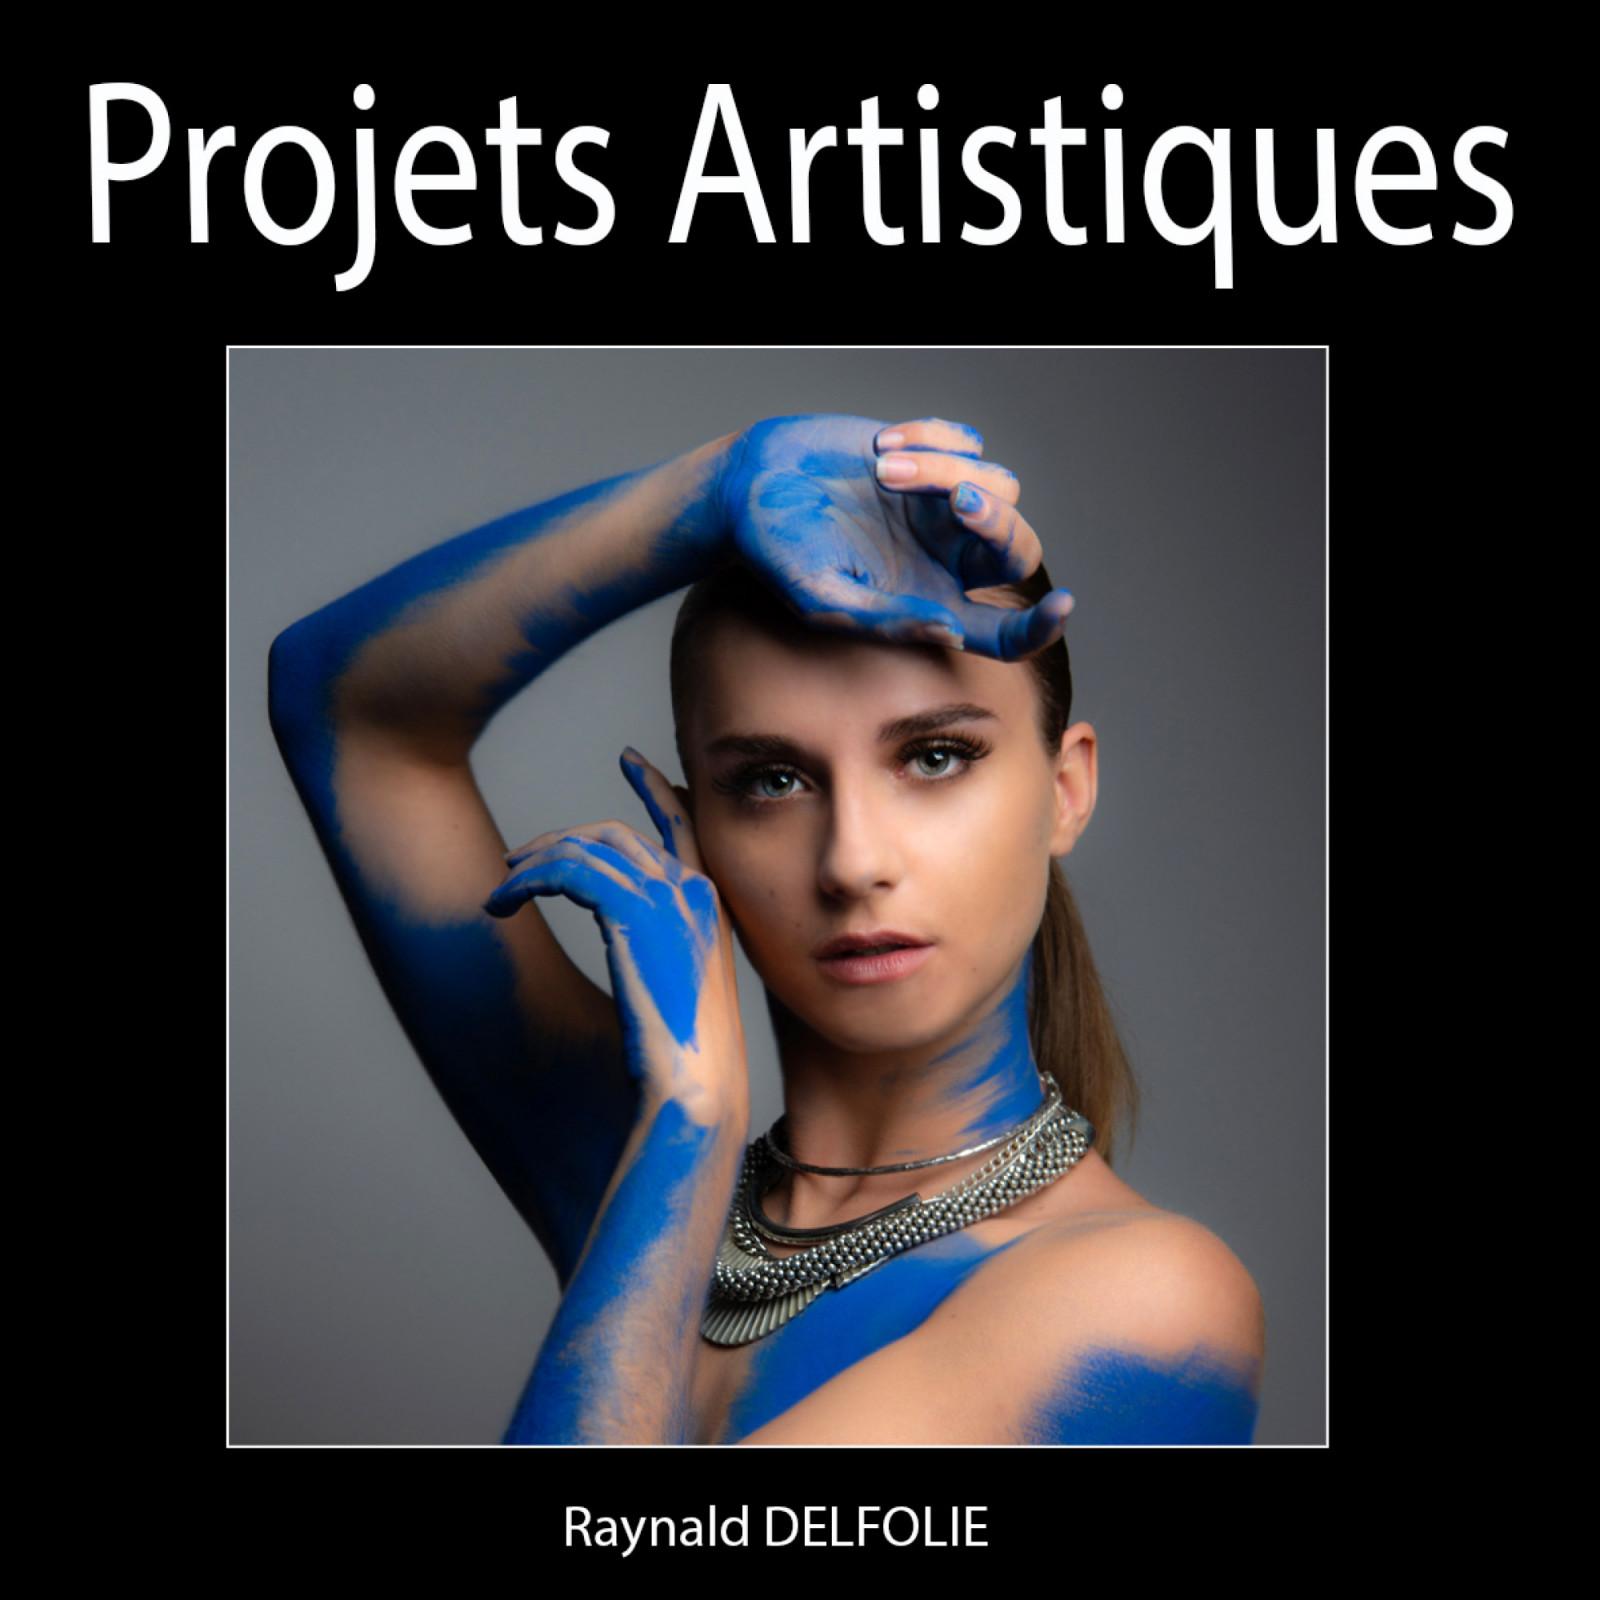 raynald-delfolie d9fc040d3386